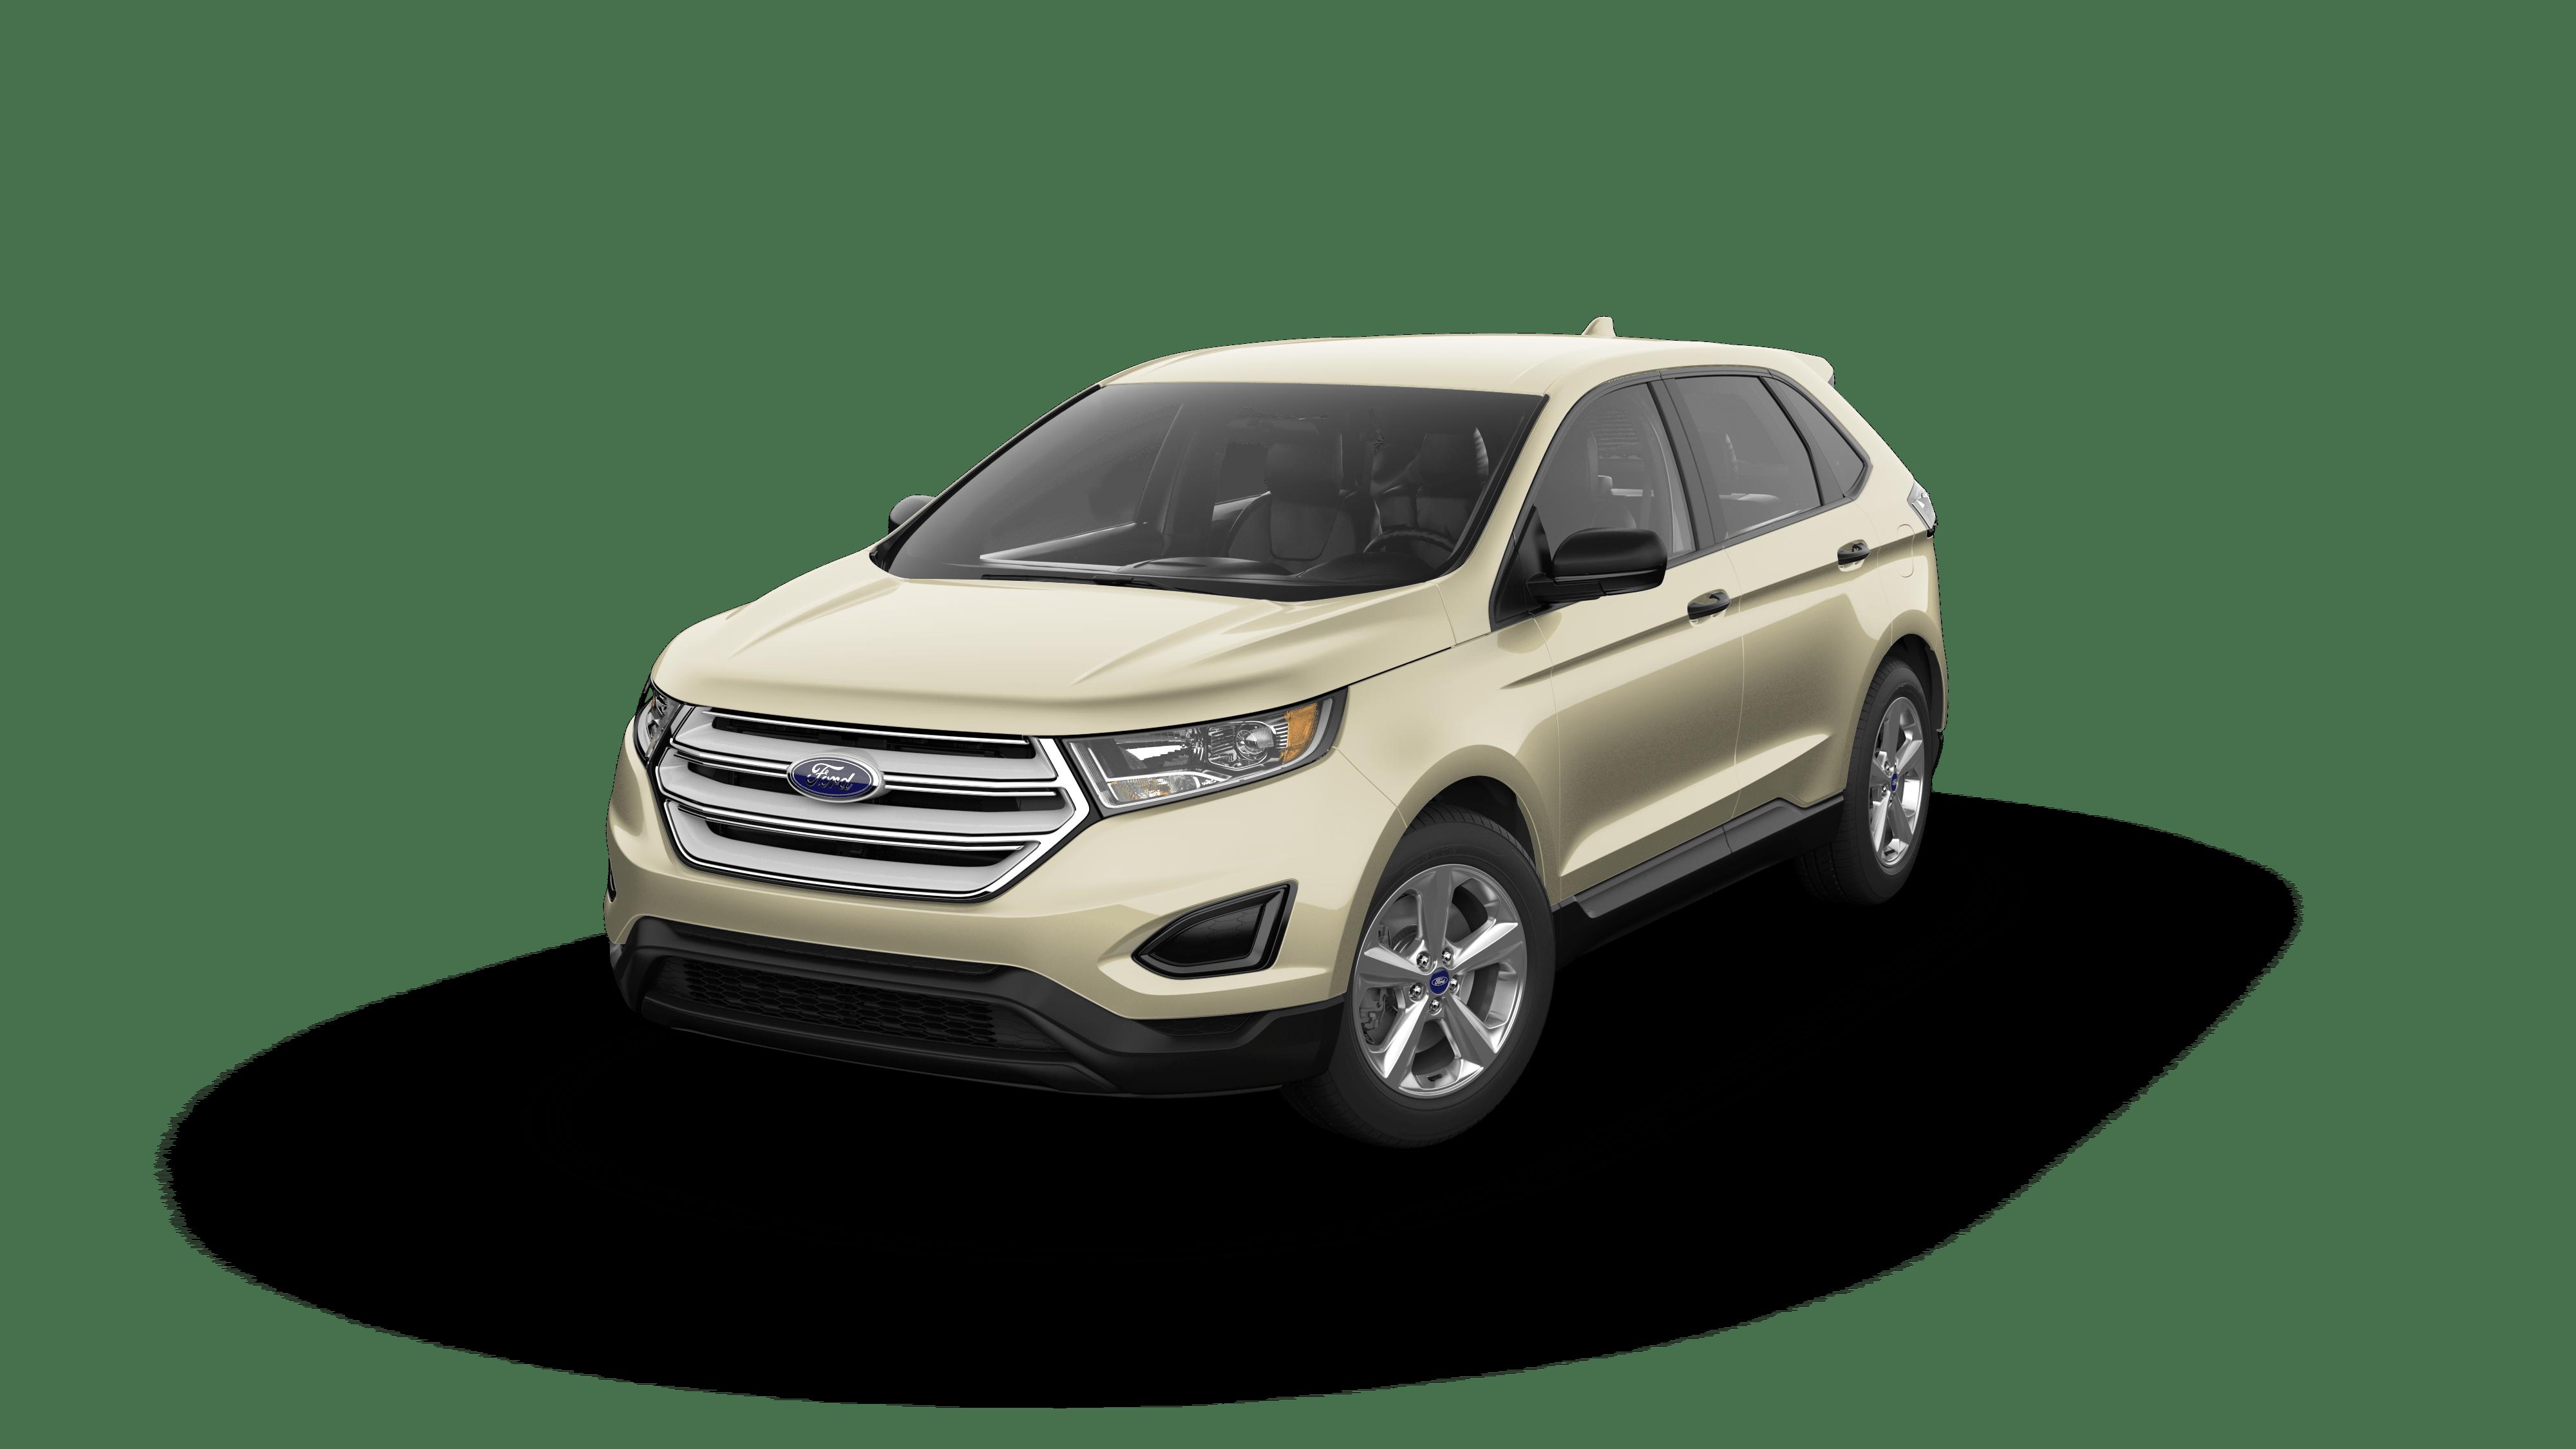 Ford Edge For Sale In Sierra Vista Fmpkgjbc Lawleys Team Ford